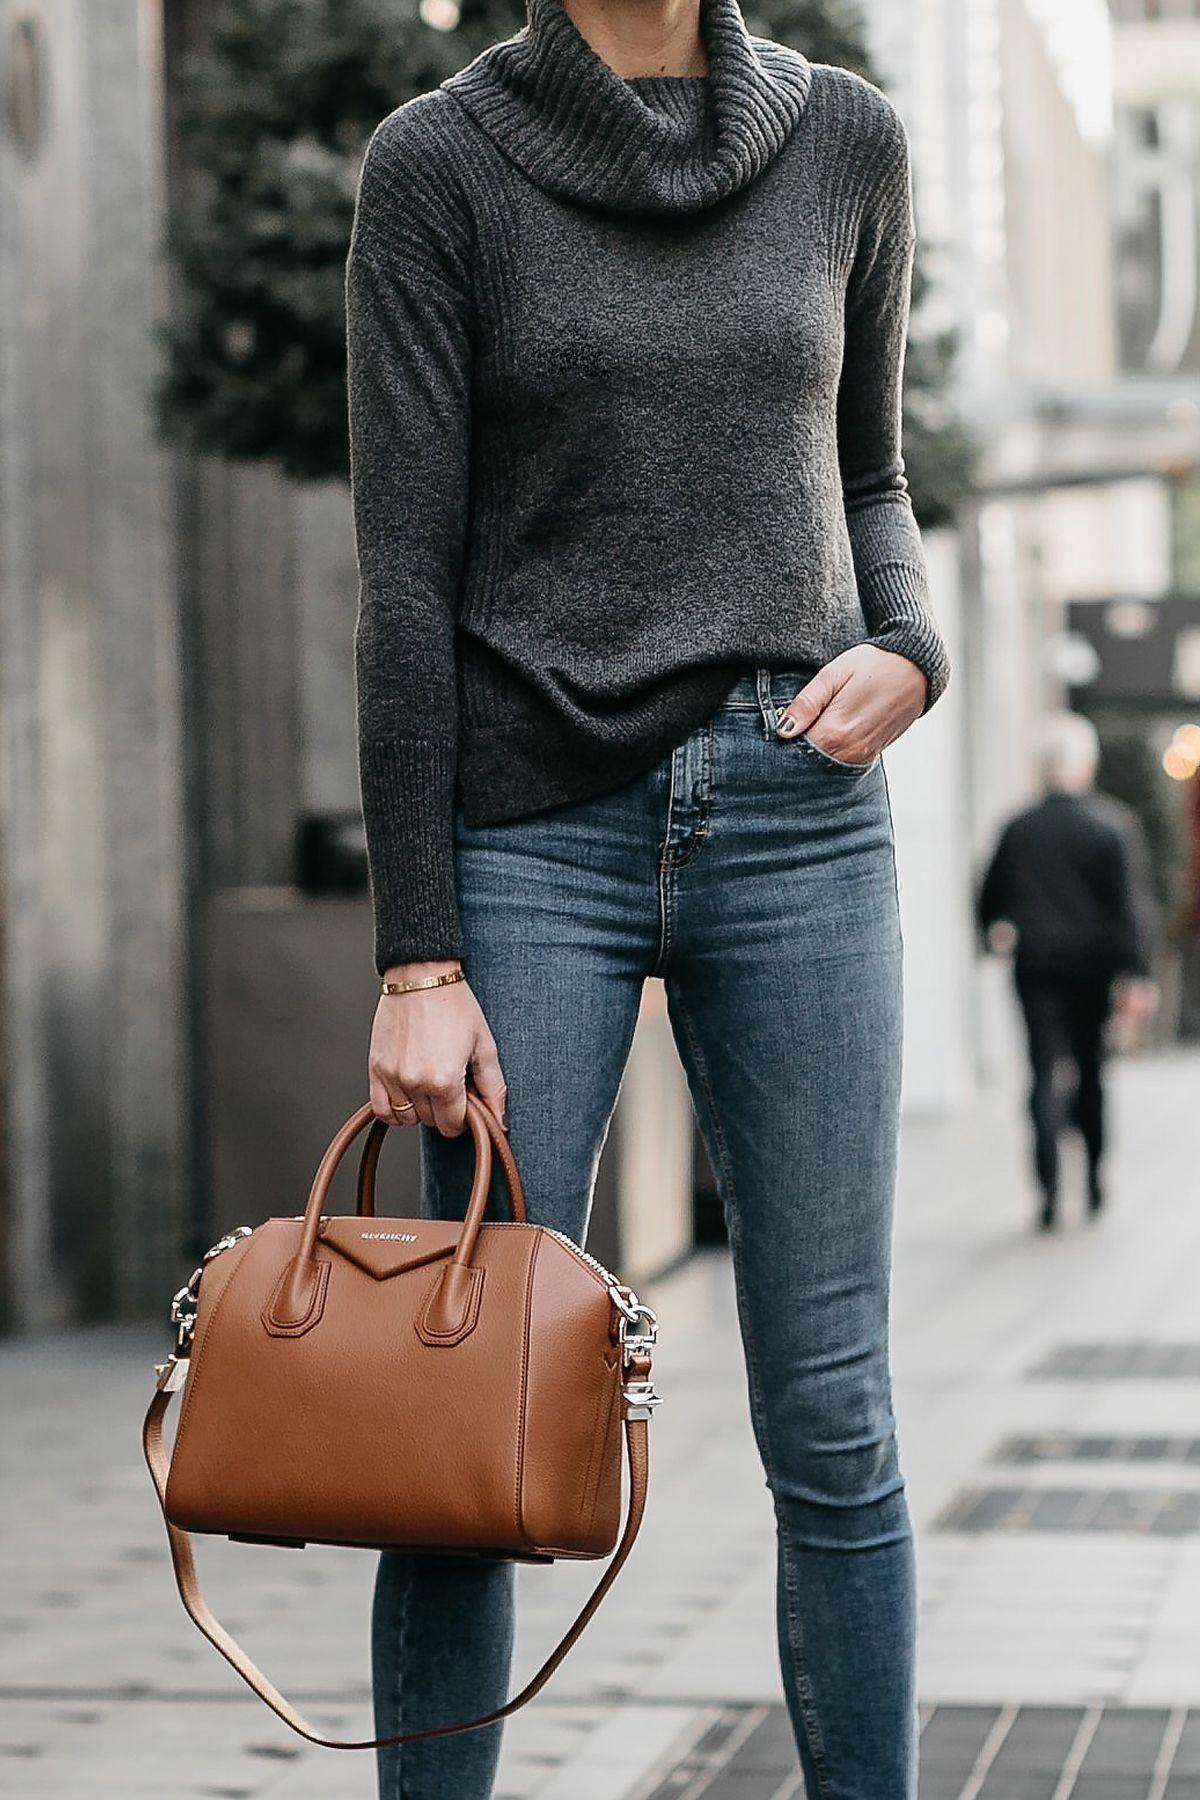 fe9fa71f802d Grey Turtleneck Sweater Denim Skinny Jeans Givenchy Antigona Cognac Handbag  Fashion Jackson Dallas Blogger Fashion Blogger Street Style   Designerhandbags